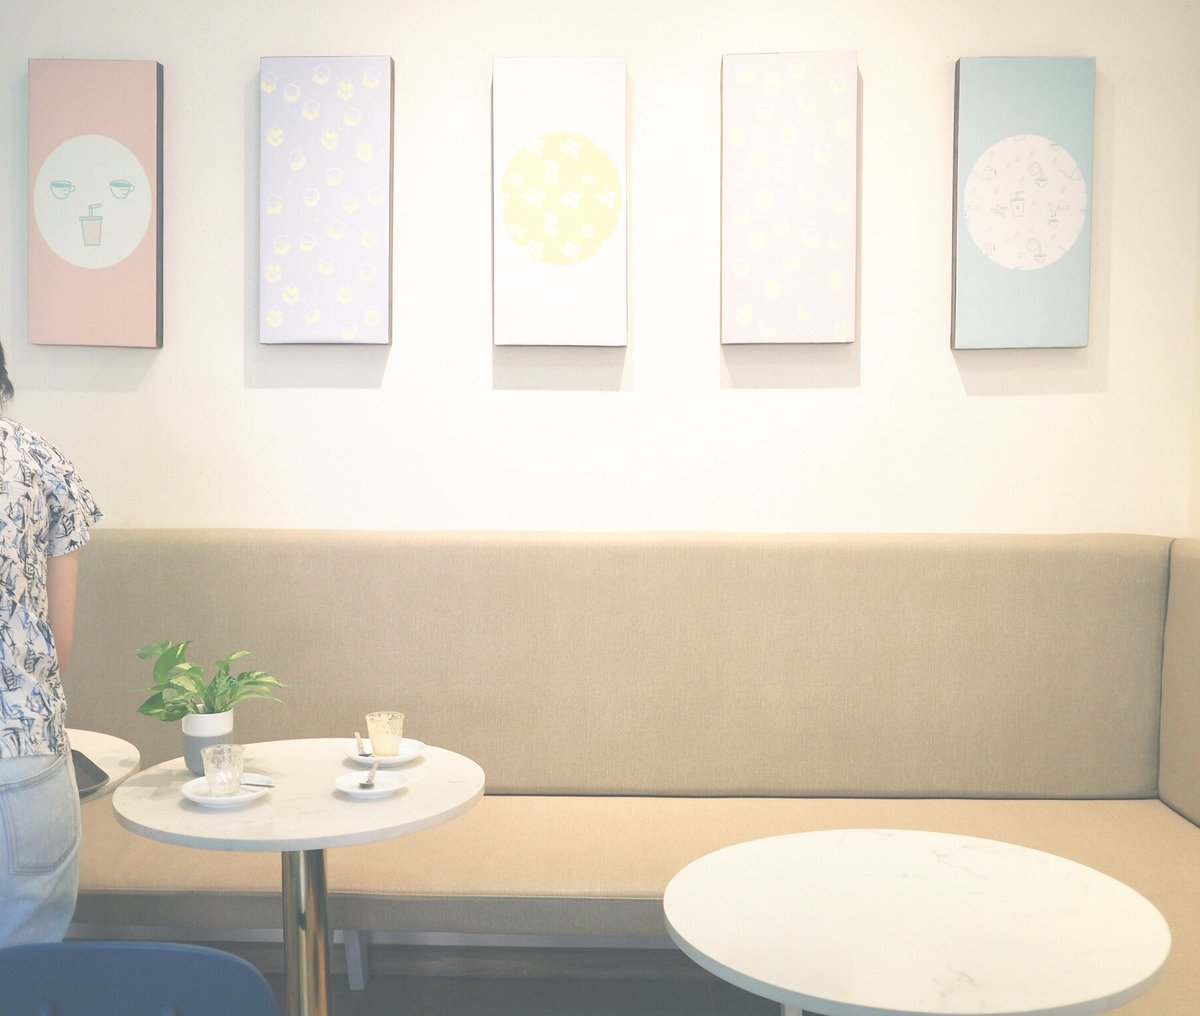 Brewing room   Pastel สวยใส ชอบบบ #รีวิวเชียงใหม่ #reviewchiangmai  #ReviewThailand <br>http://pic.twitter.com/gaCQpN0FD8